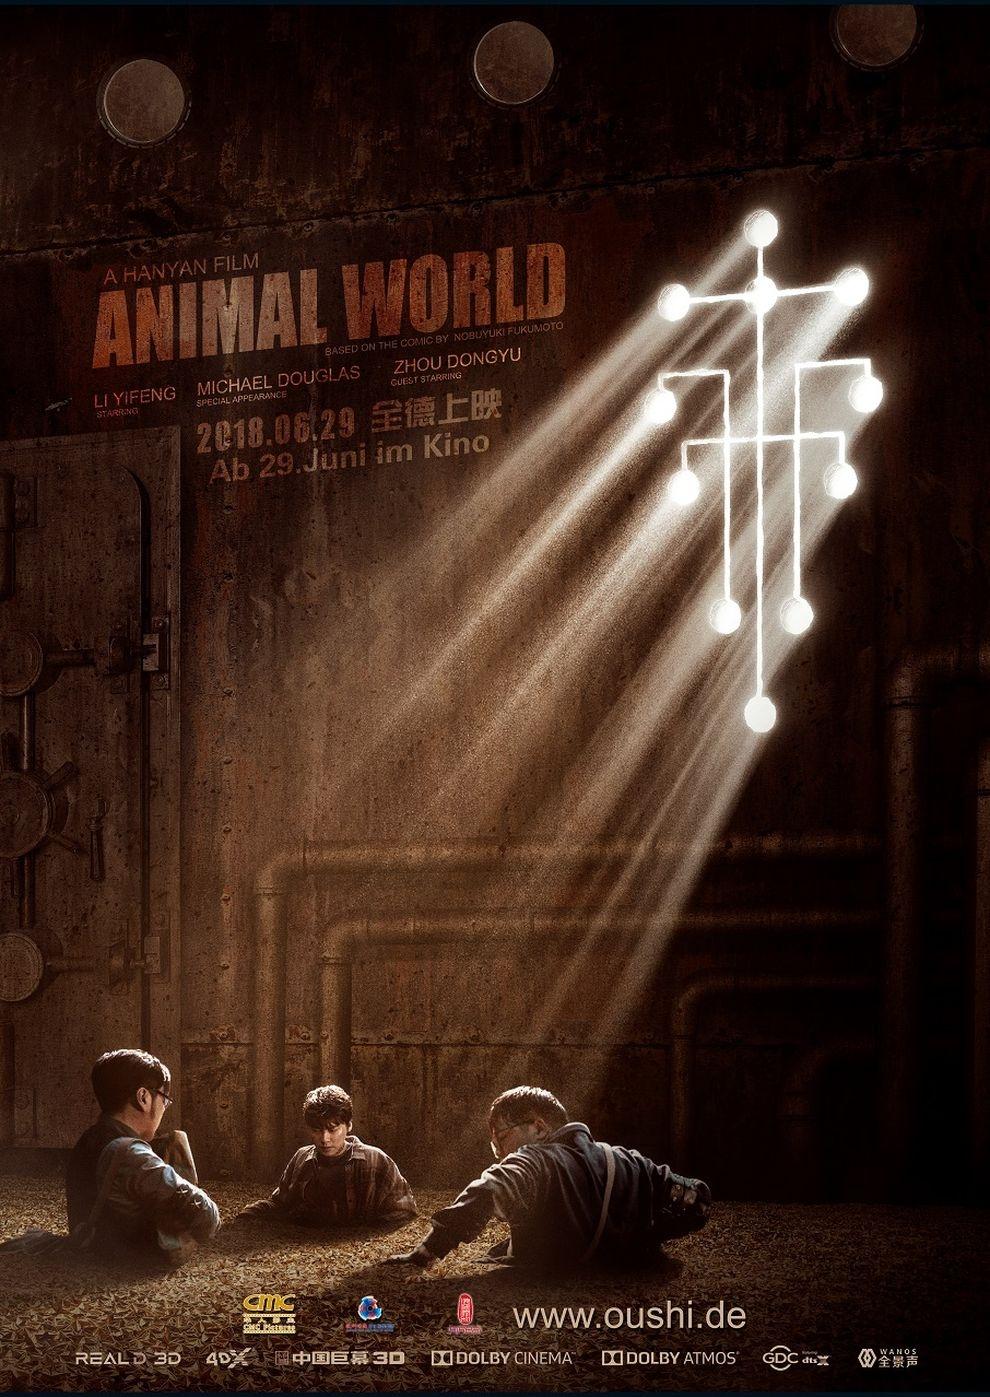 Animal World (Poster)